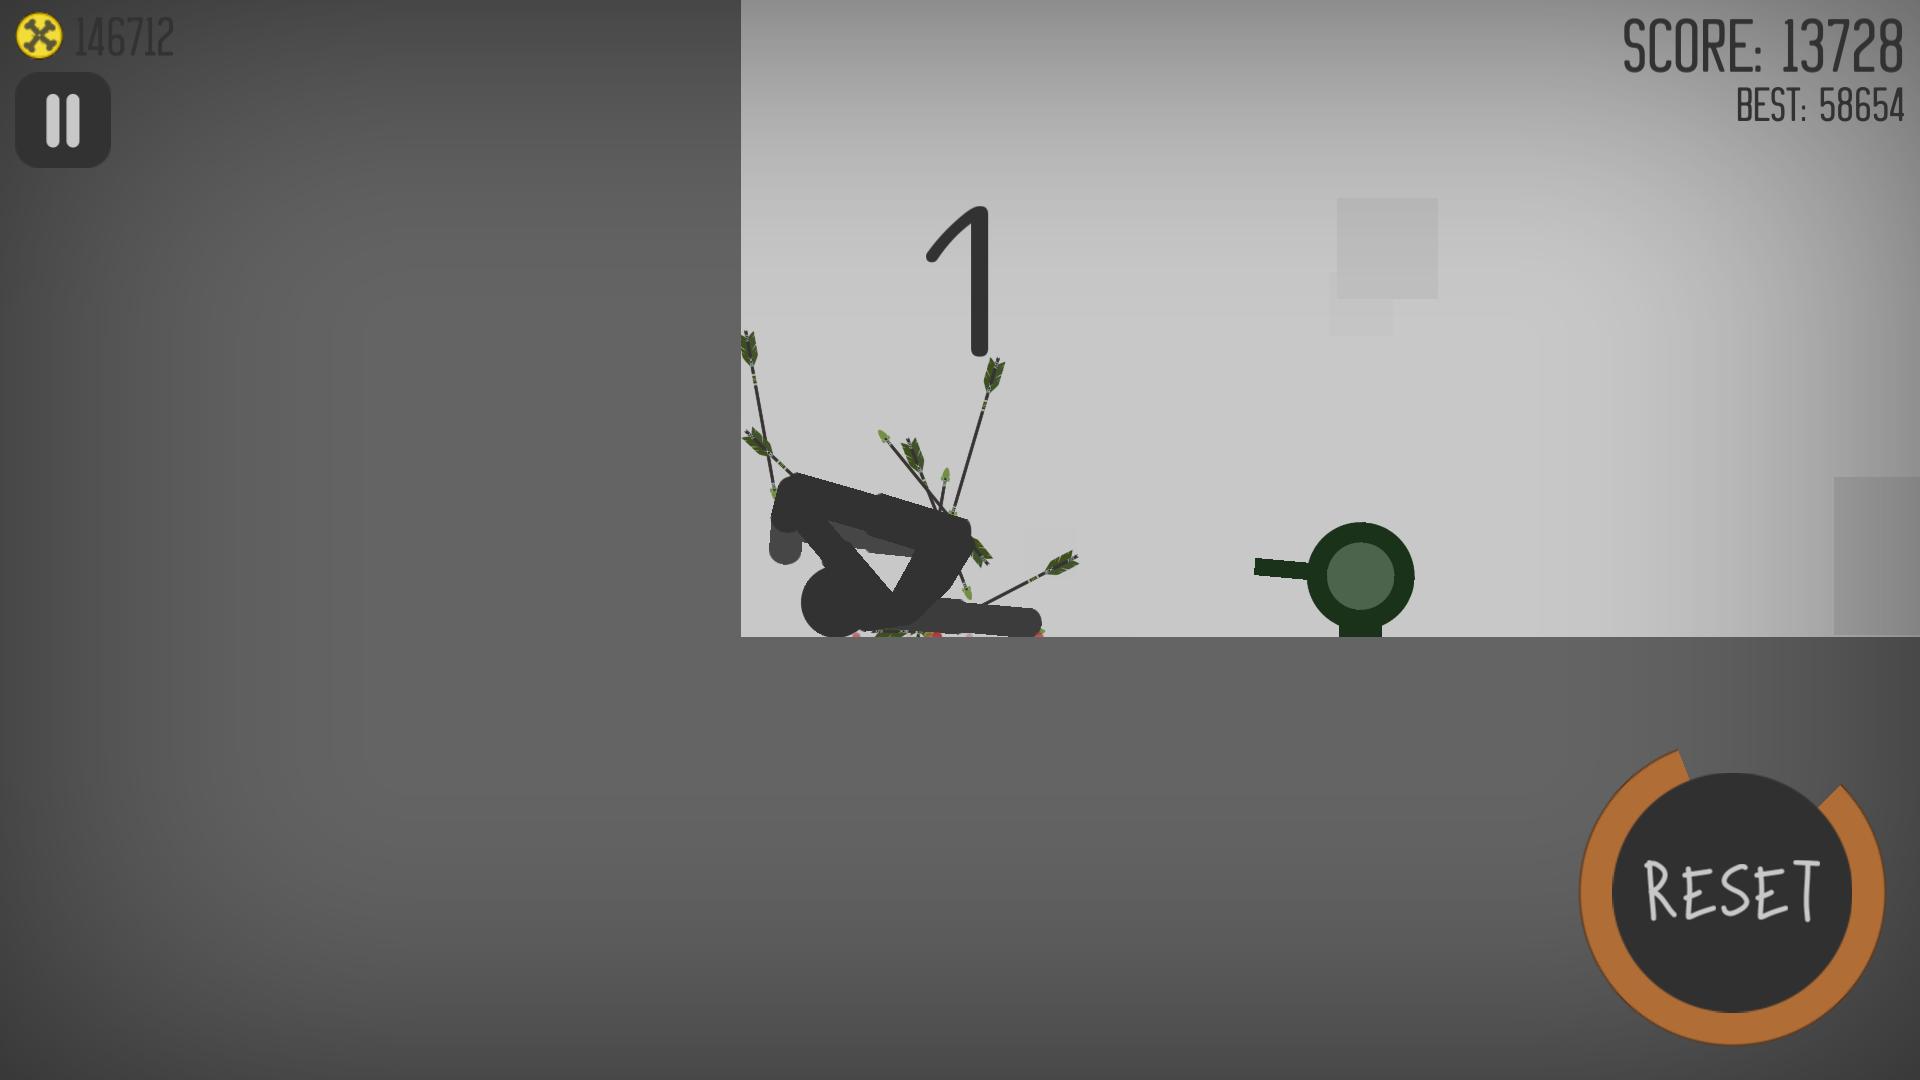 androidアプリ Stickman Dismounting攻略スクリーンショット5